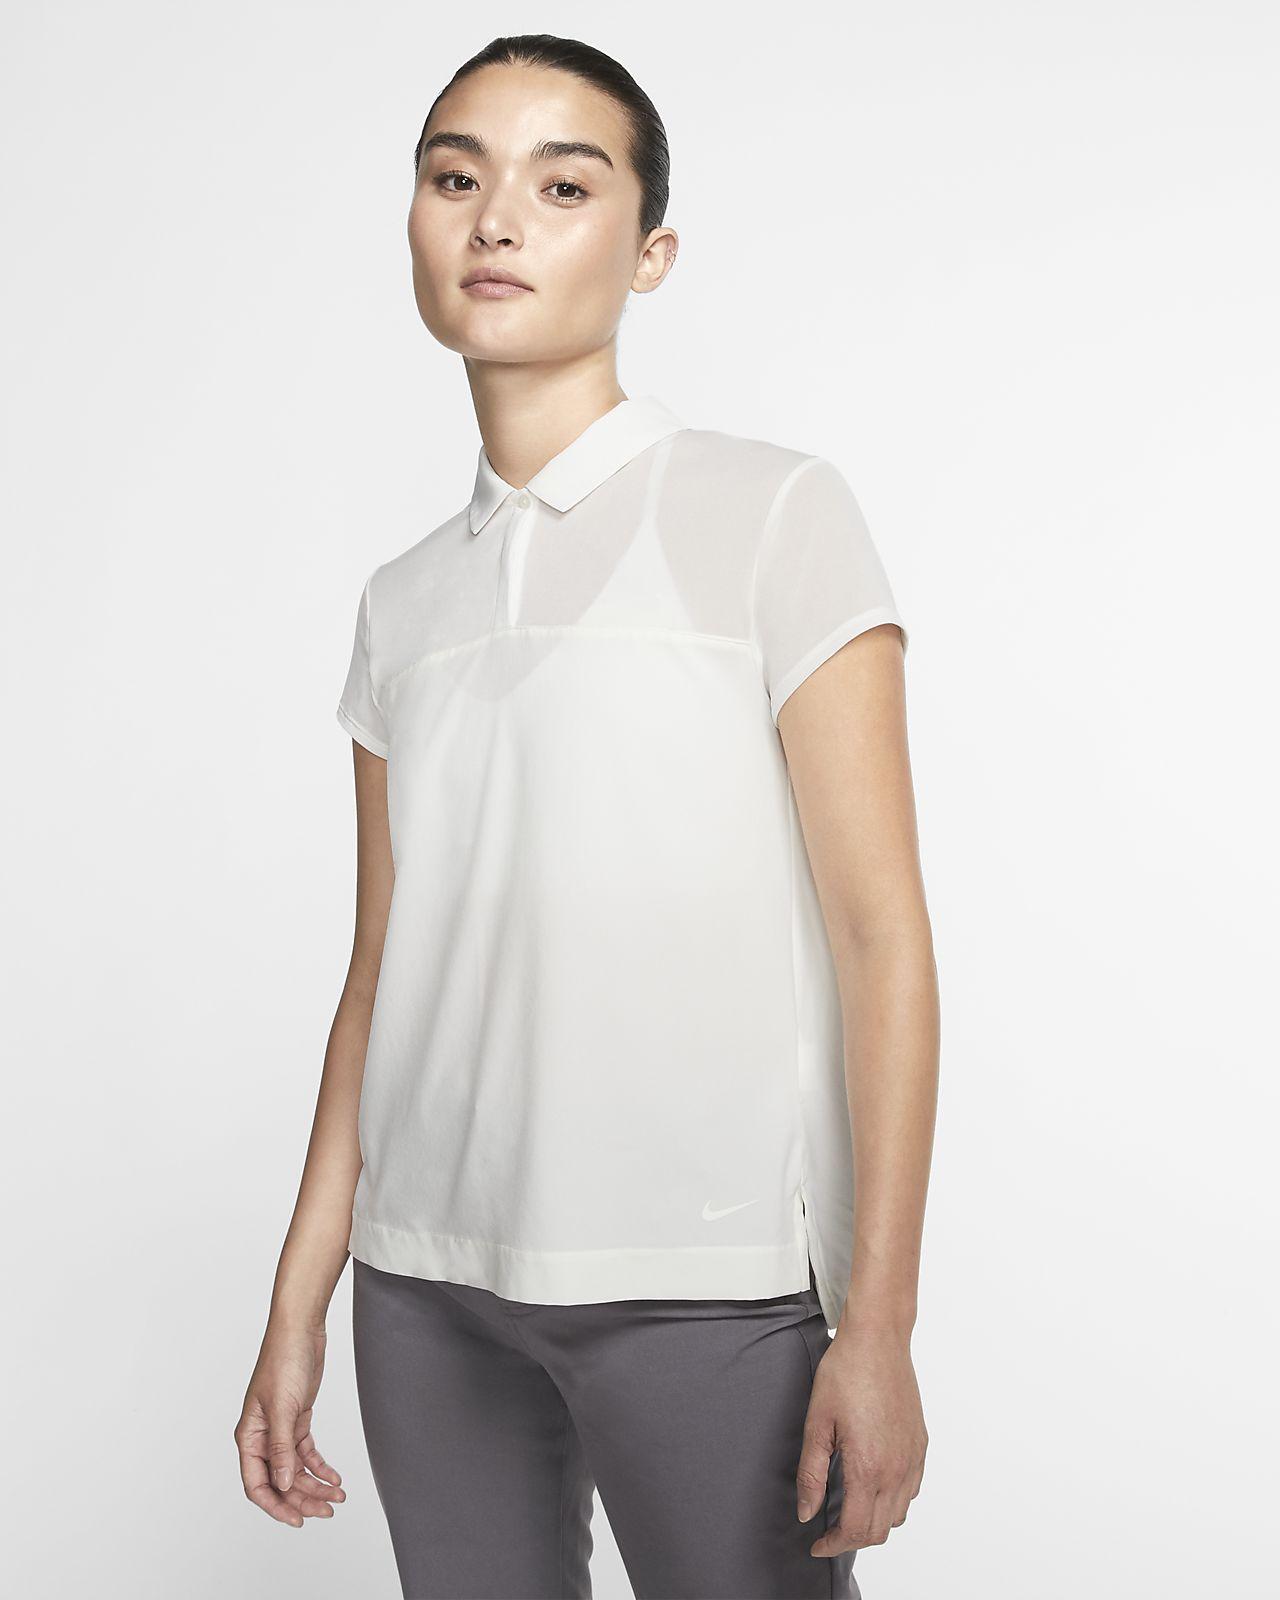 Dámská golfová polokošile Nike Flex